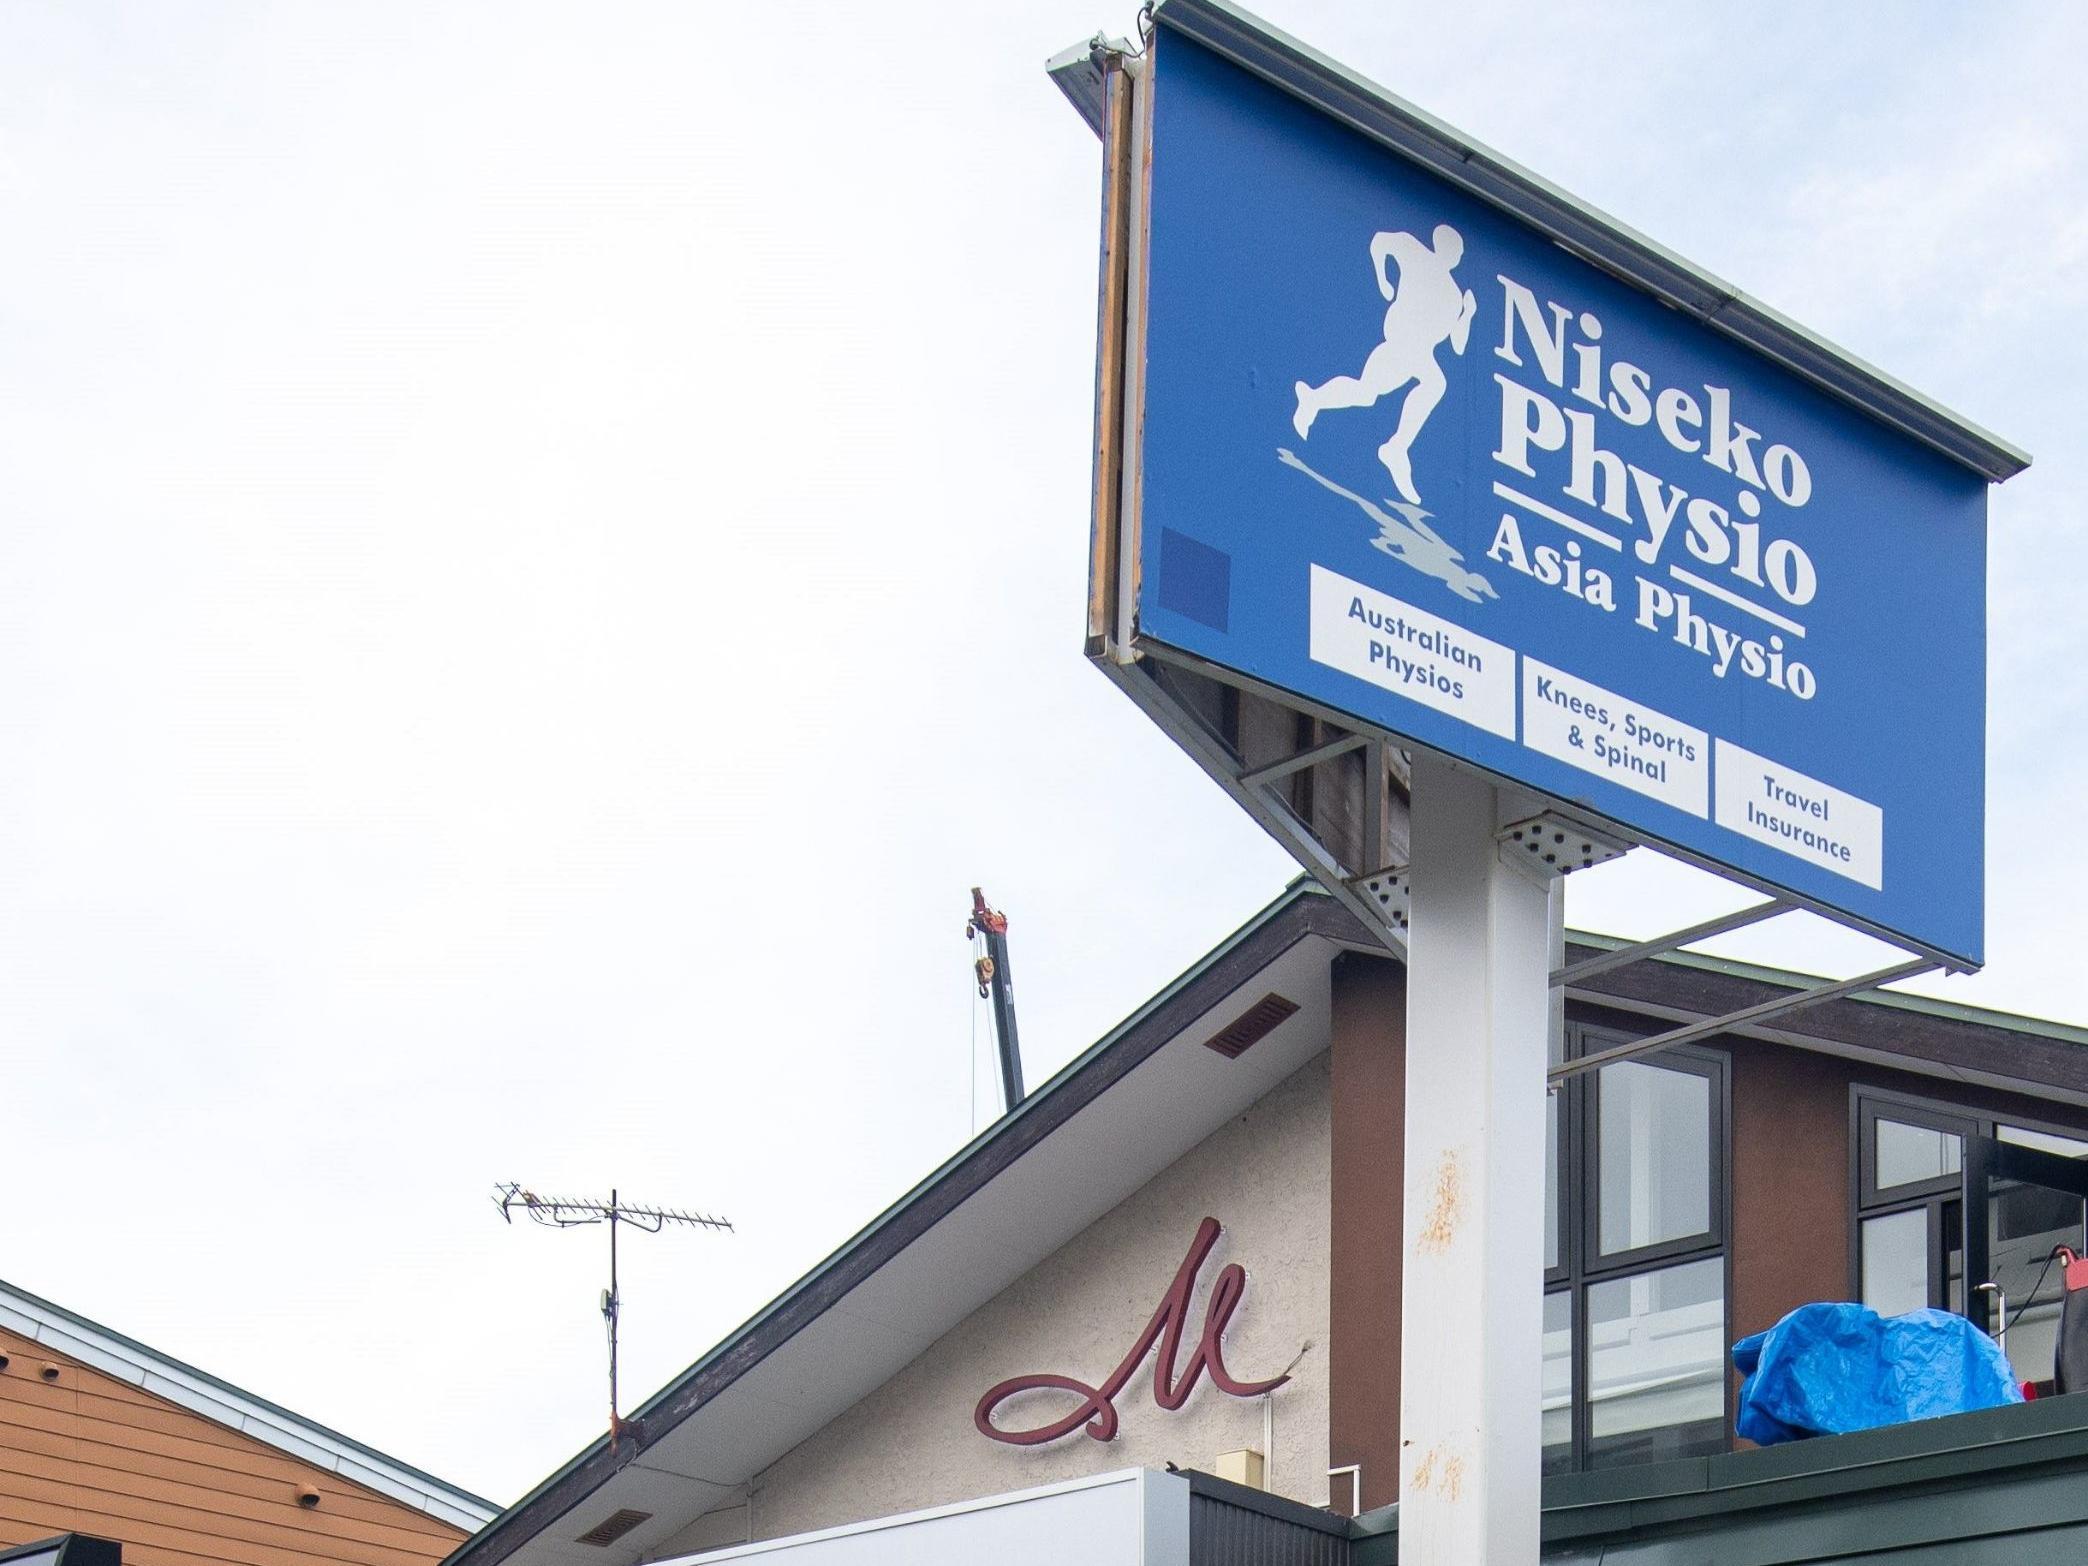 Entrance board of Niseko physio near Chatrium Niseko Japan